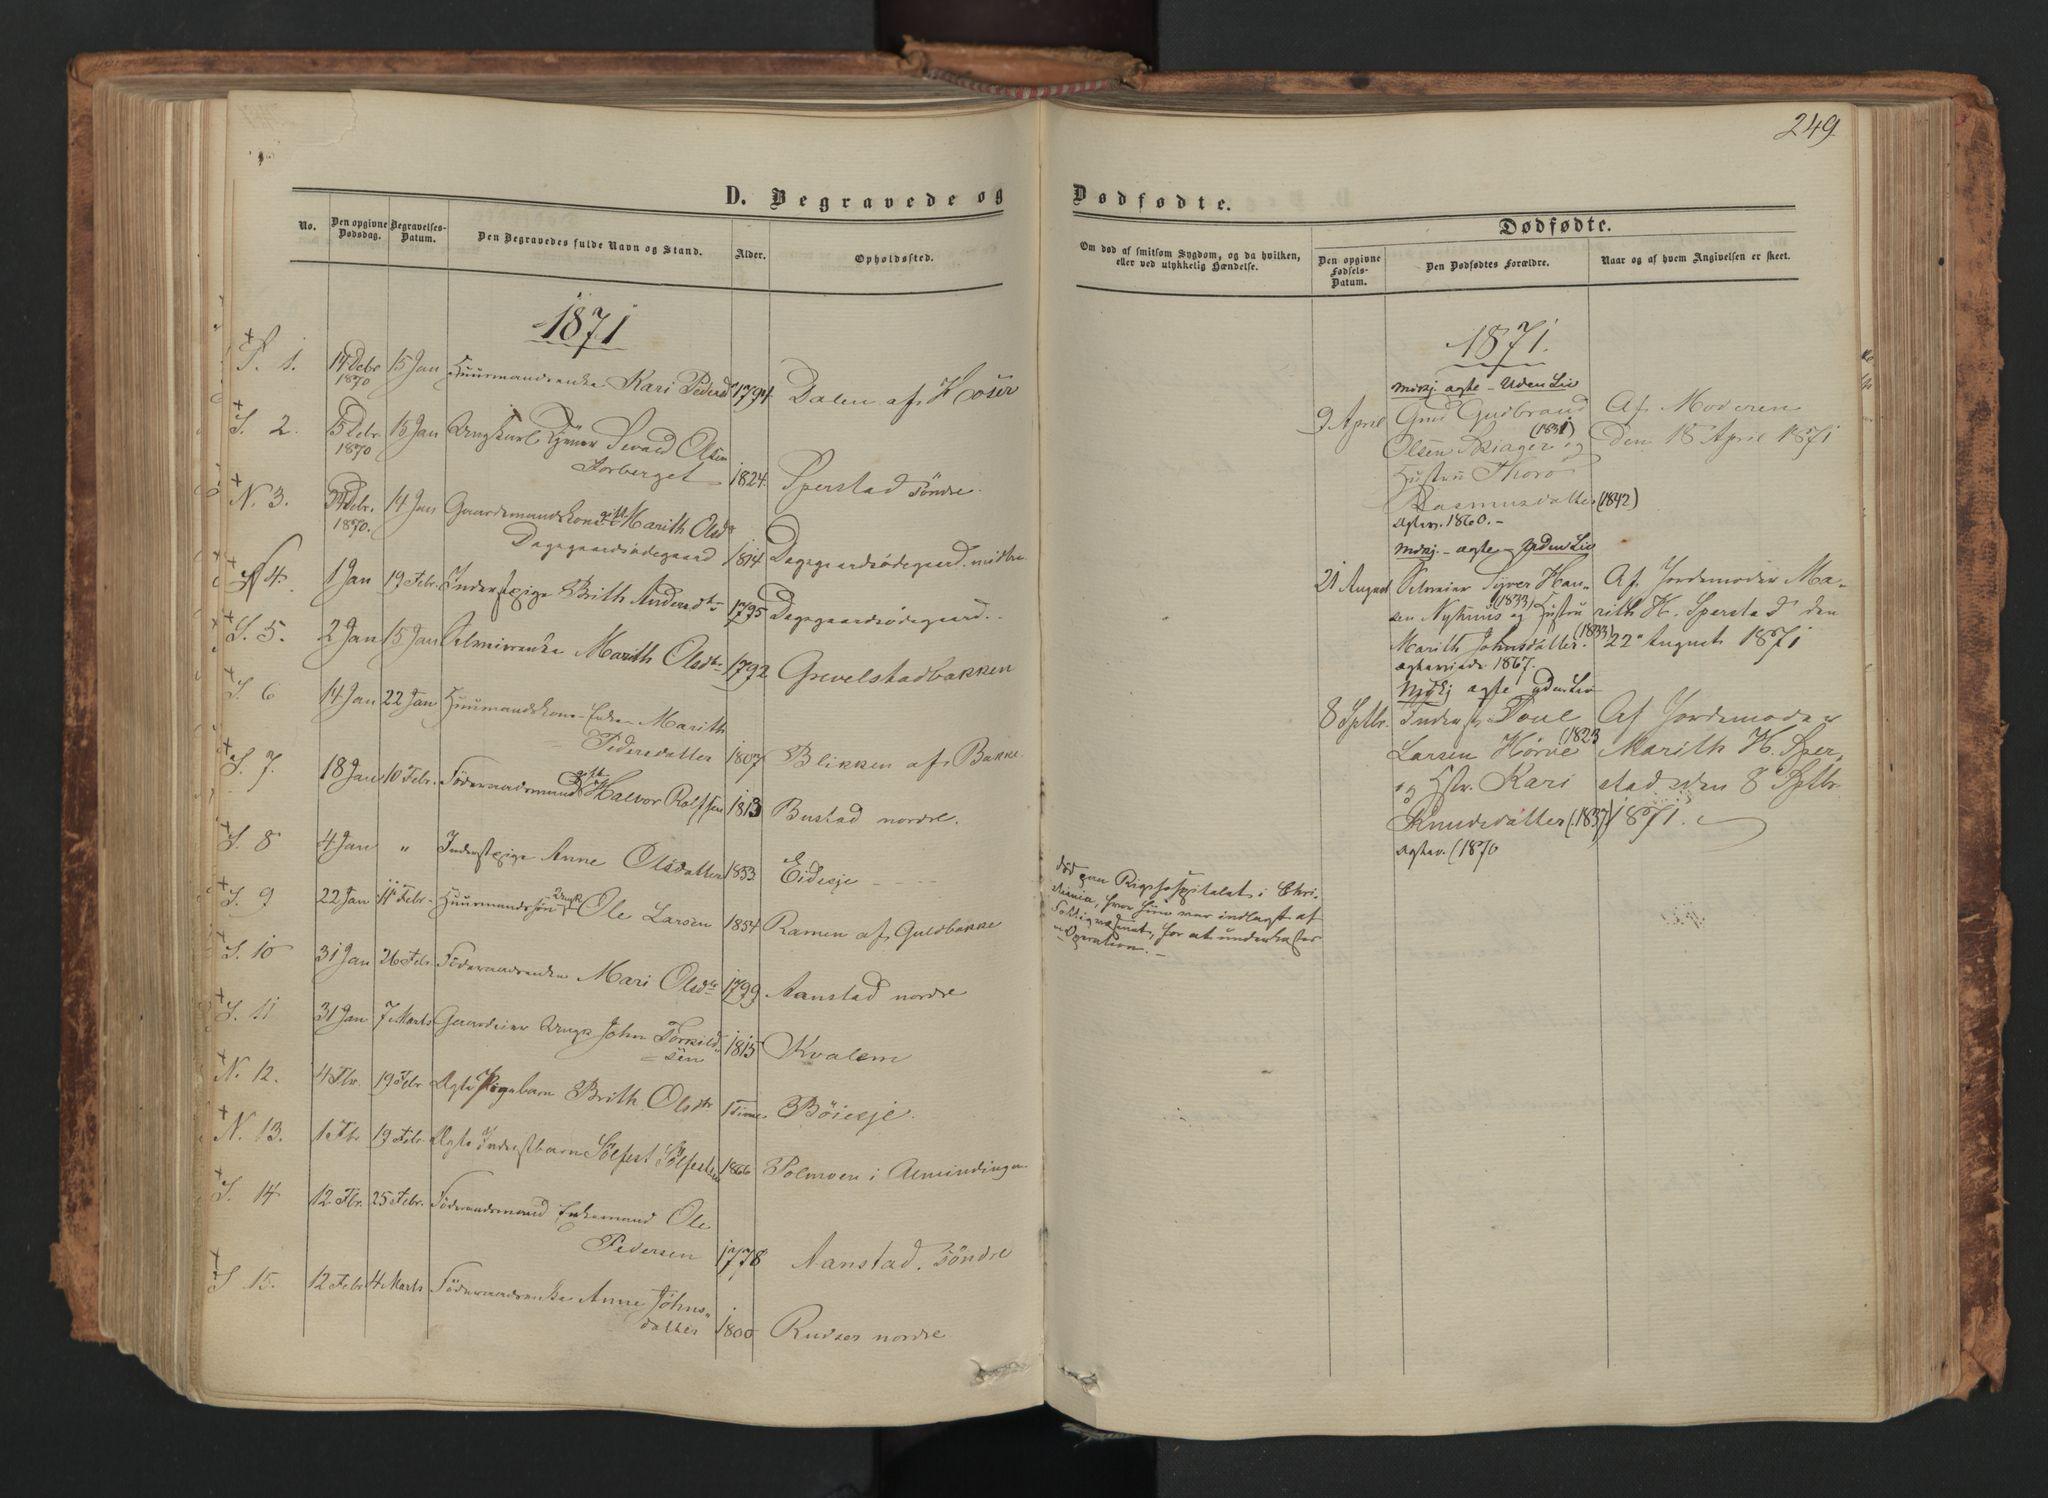 SAH, Skjåk prestekontor, Ministerialbok nr. 1, 1863-1879, s. 249b